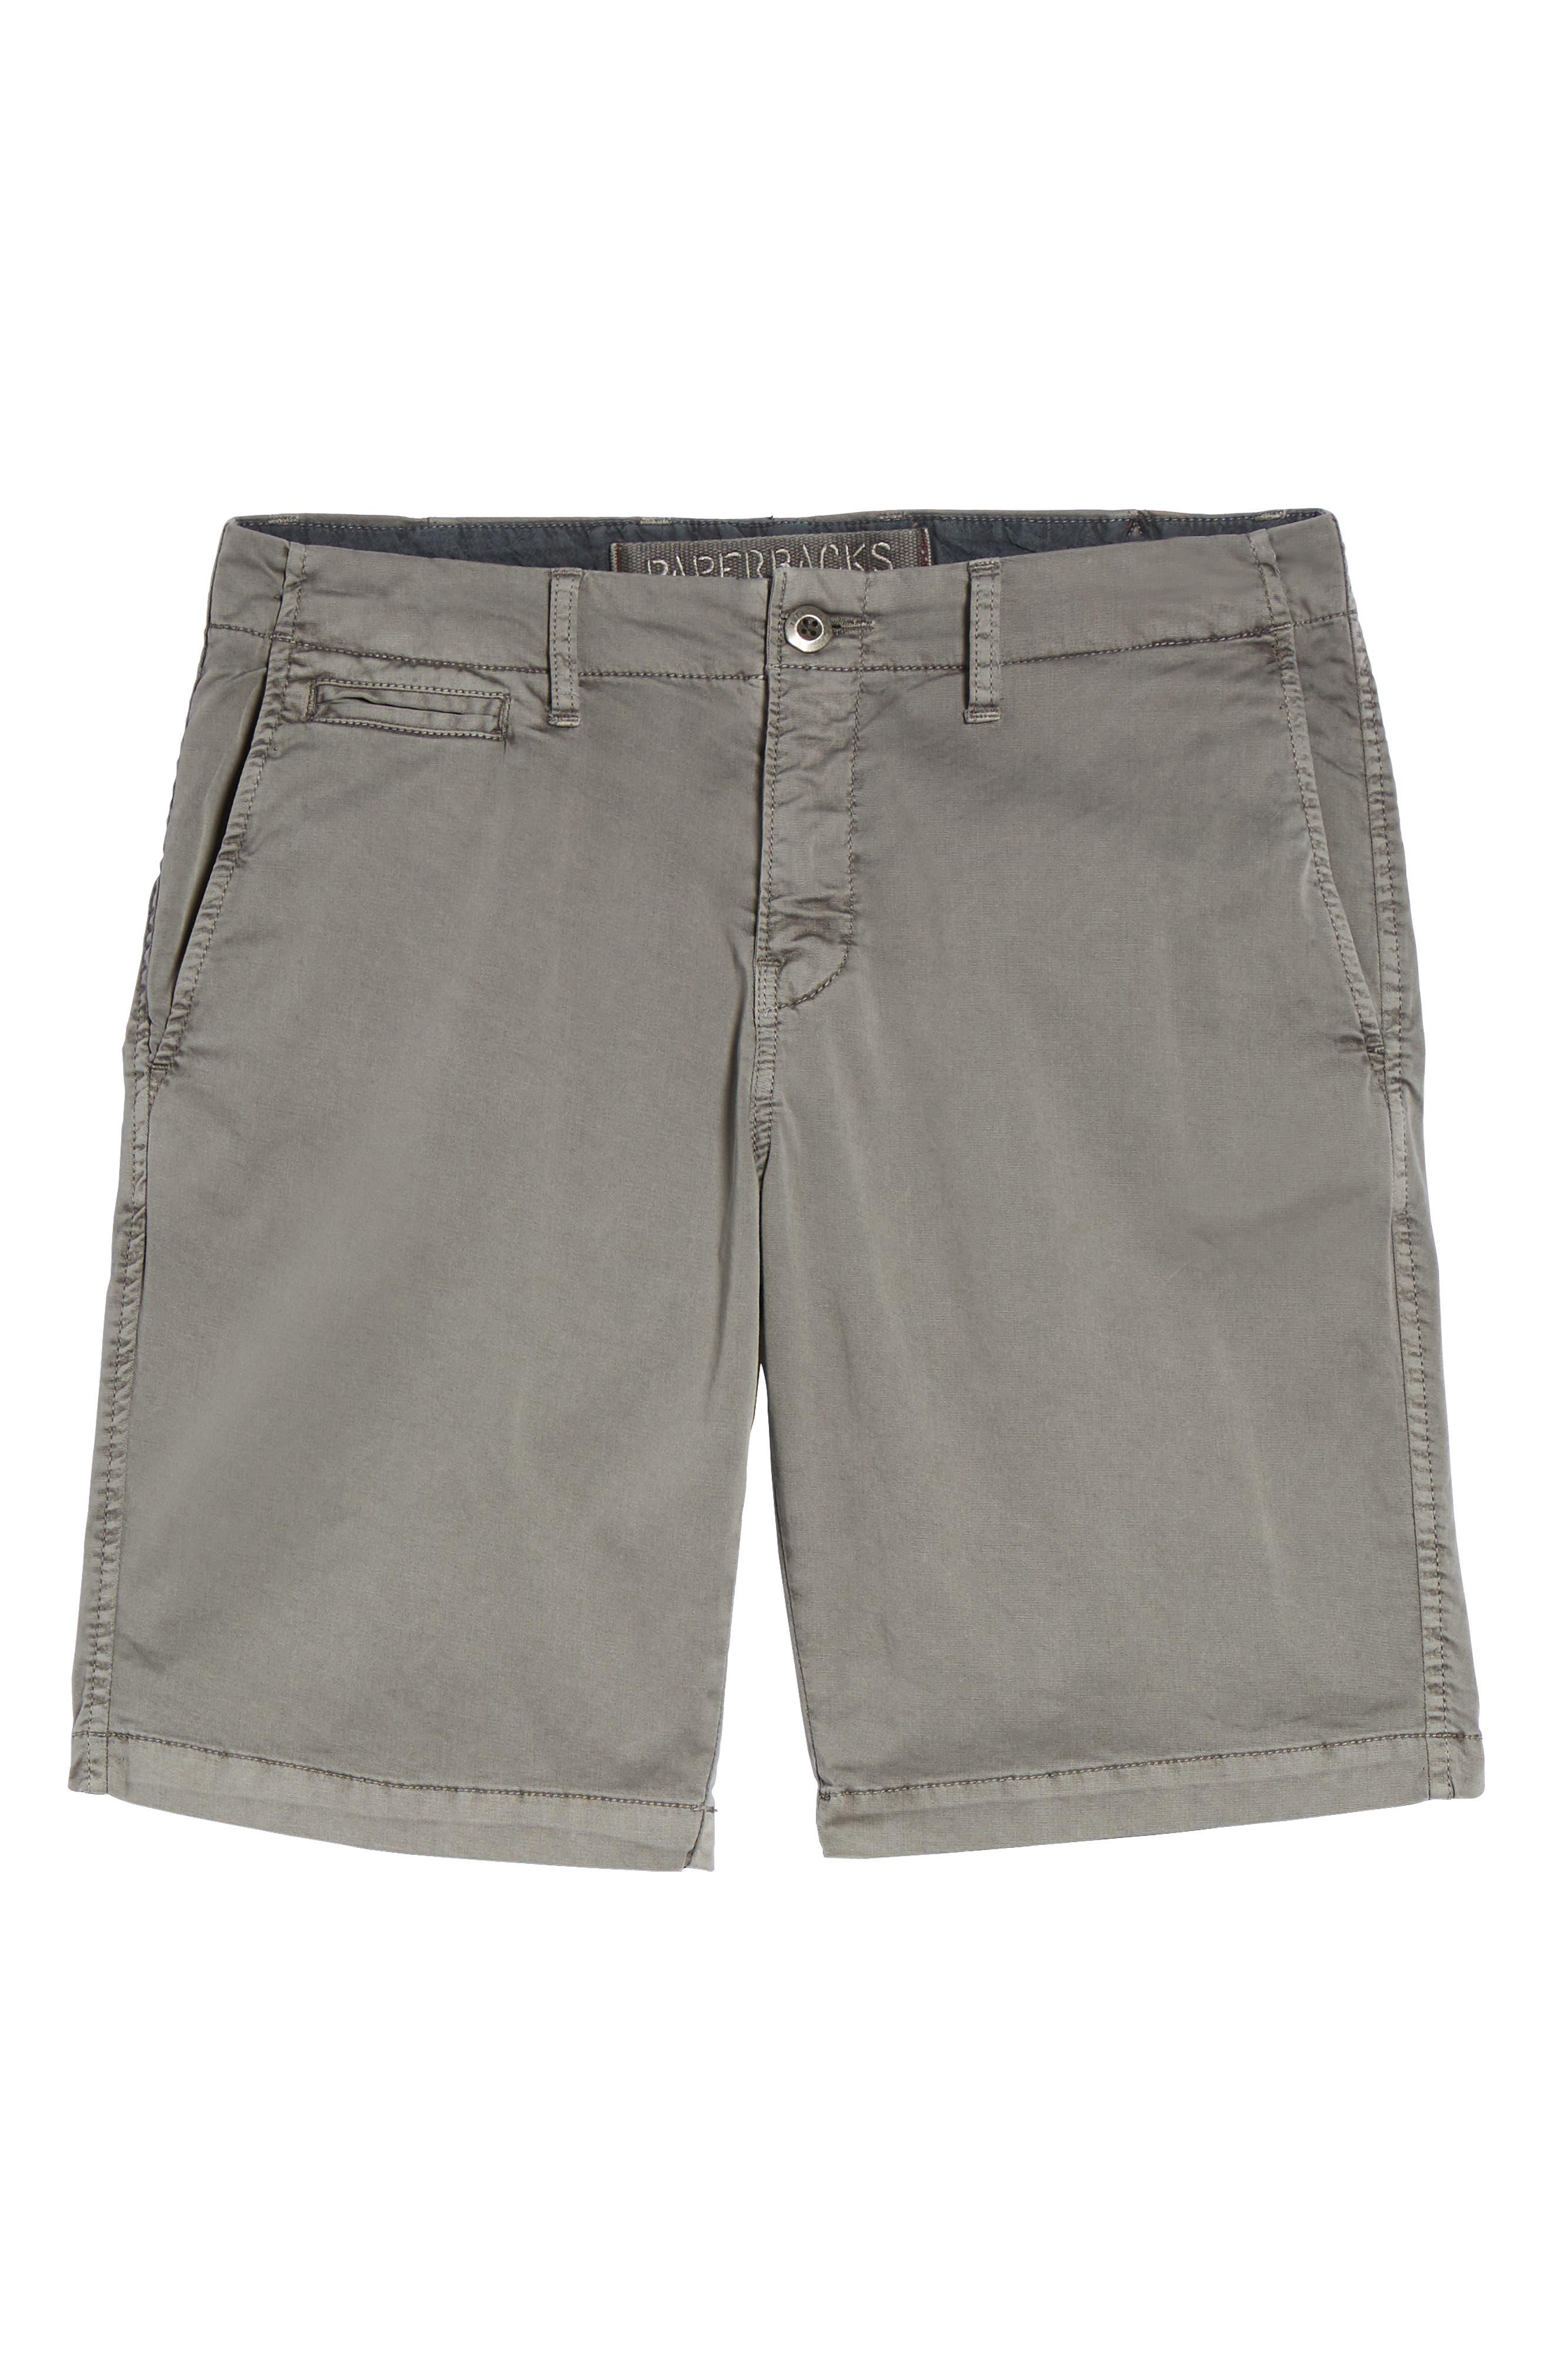 St. Barts Twill Shorts,                             Alternate thumbnail 64, color,